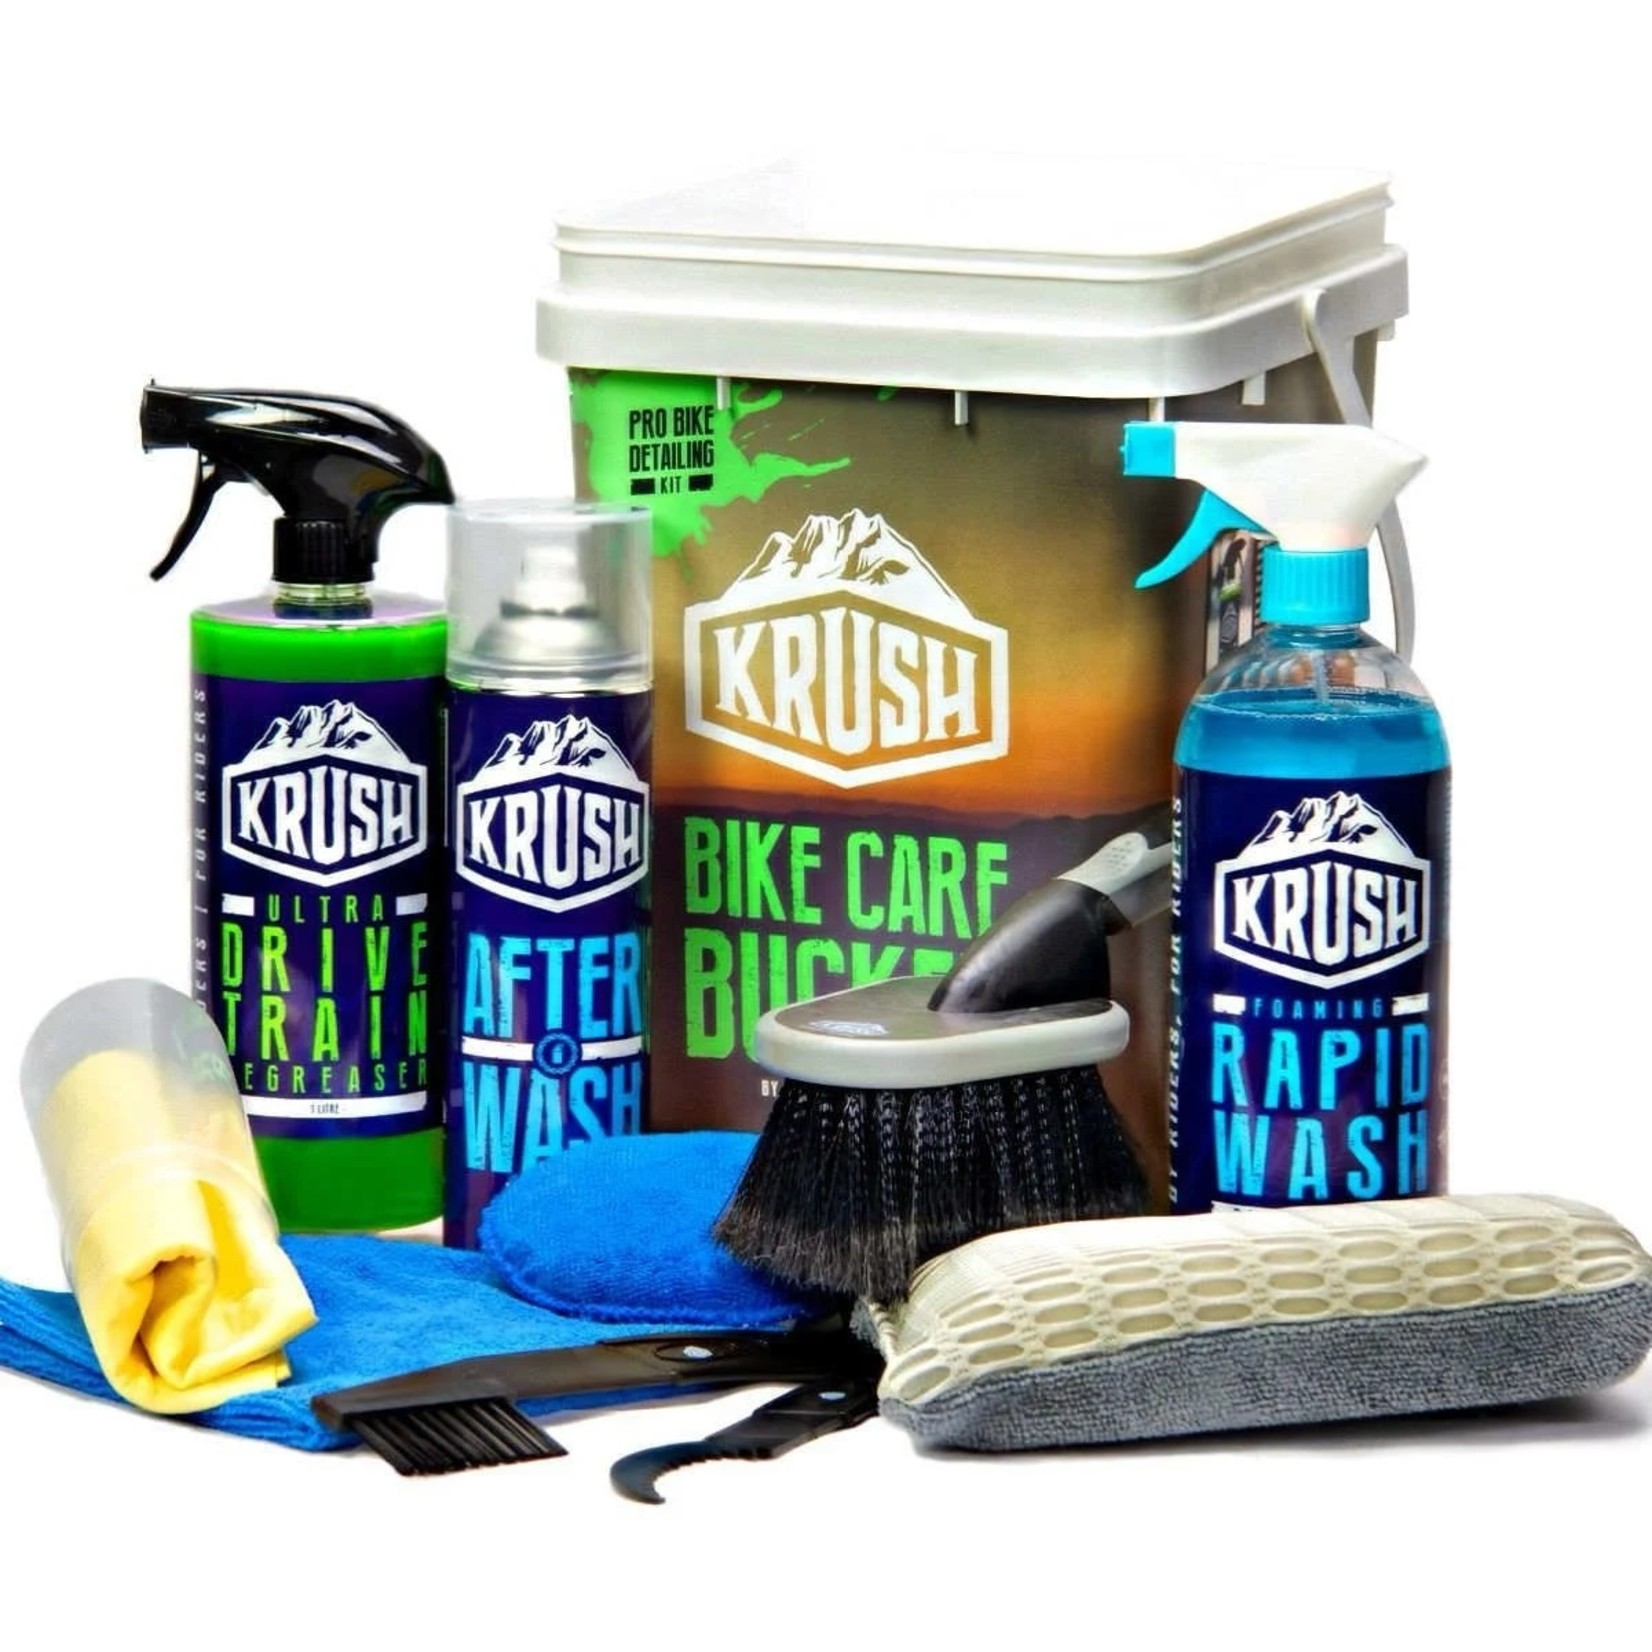 KRUSH KRUSH Pro Bike Detailing Kit